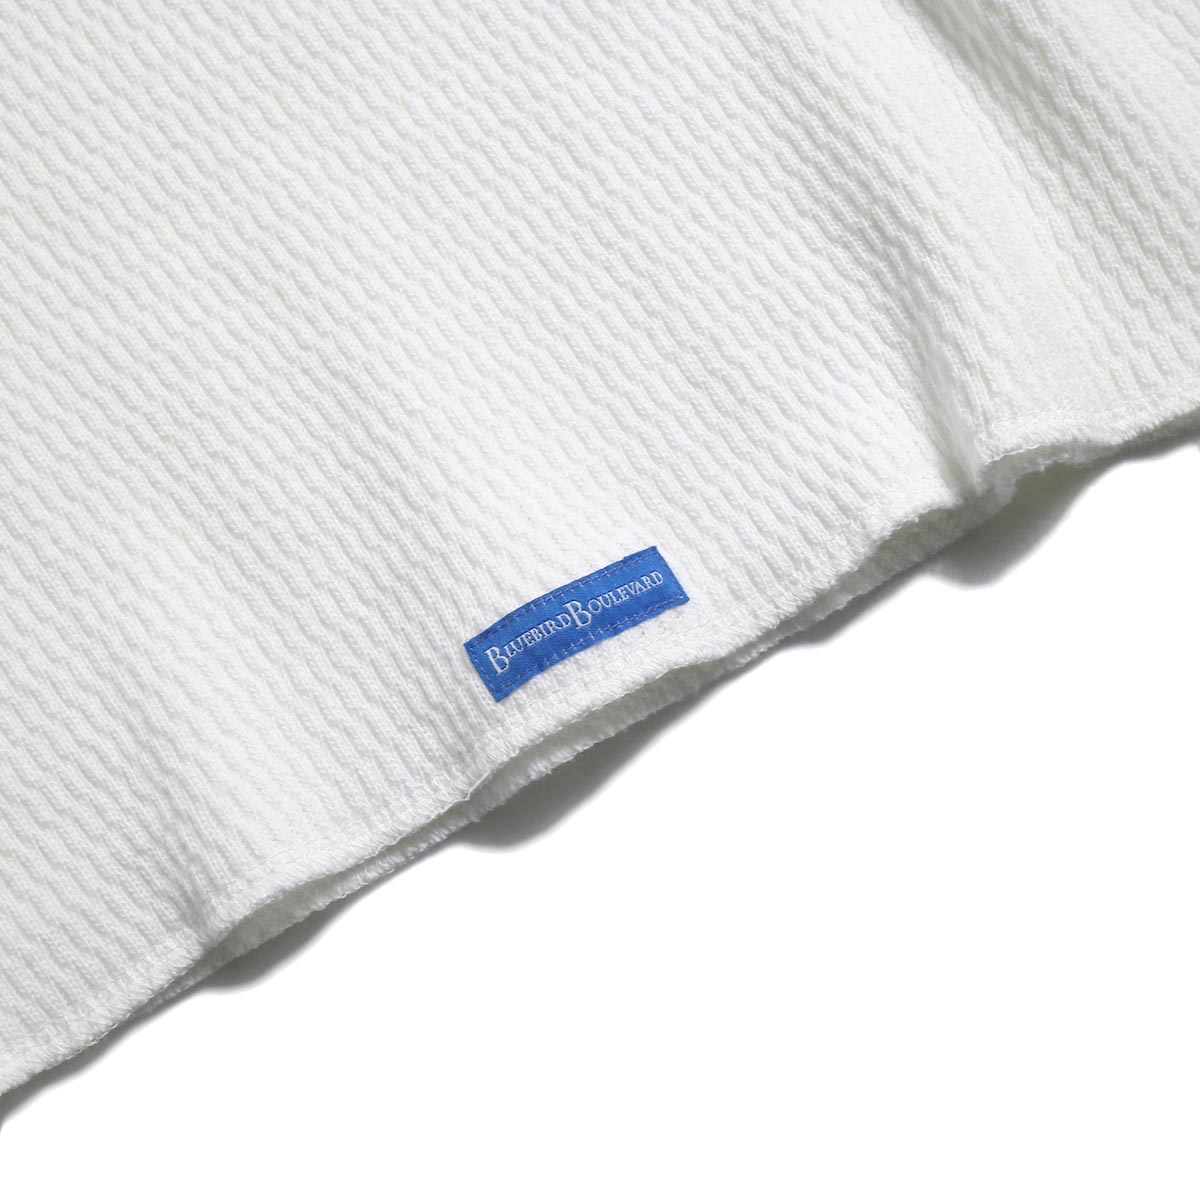 BLUEBIRD BOULEVARD / ハニカムワッフルトップ -White 裾